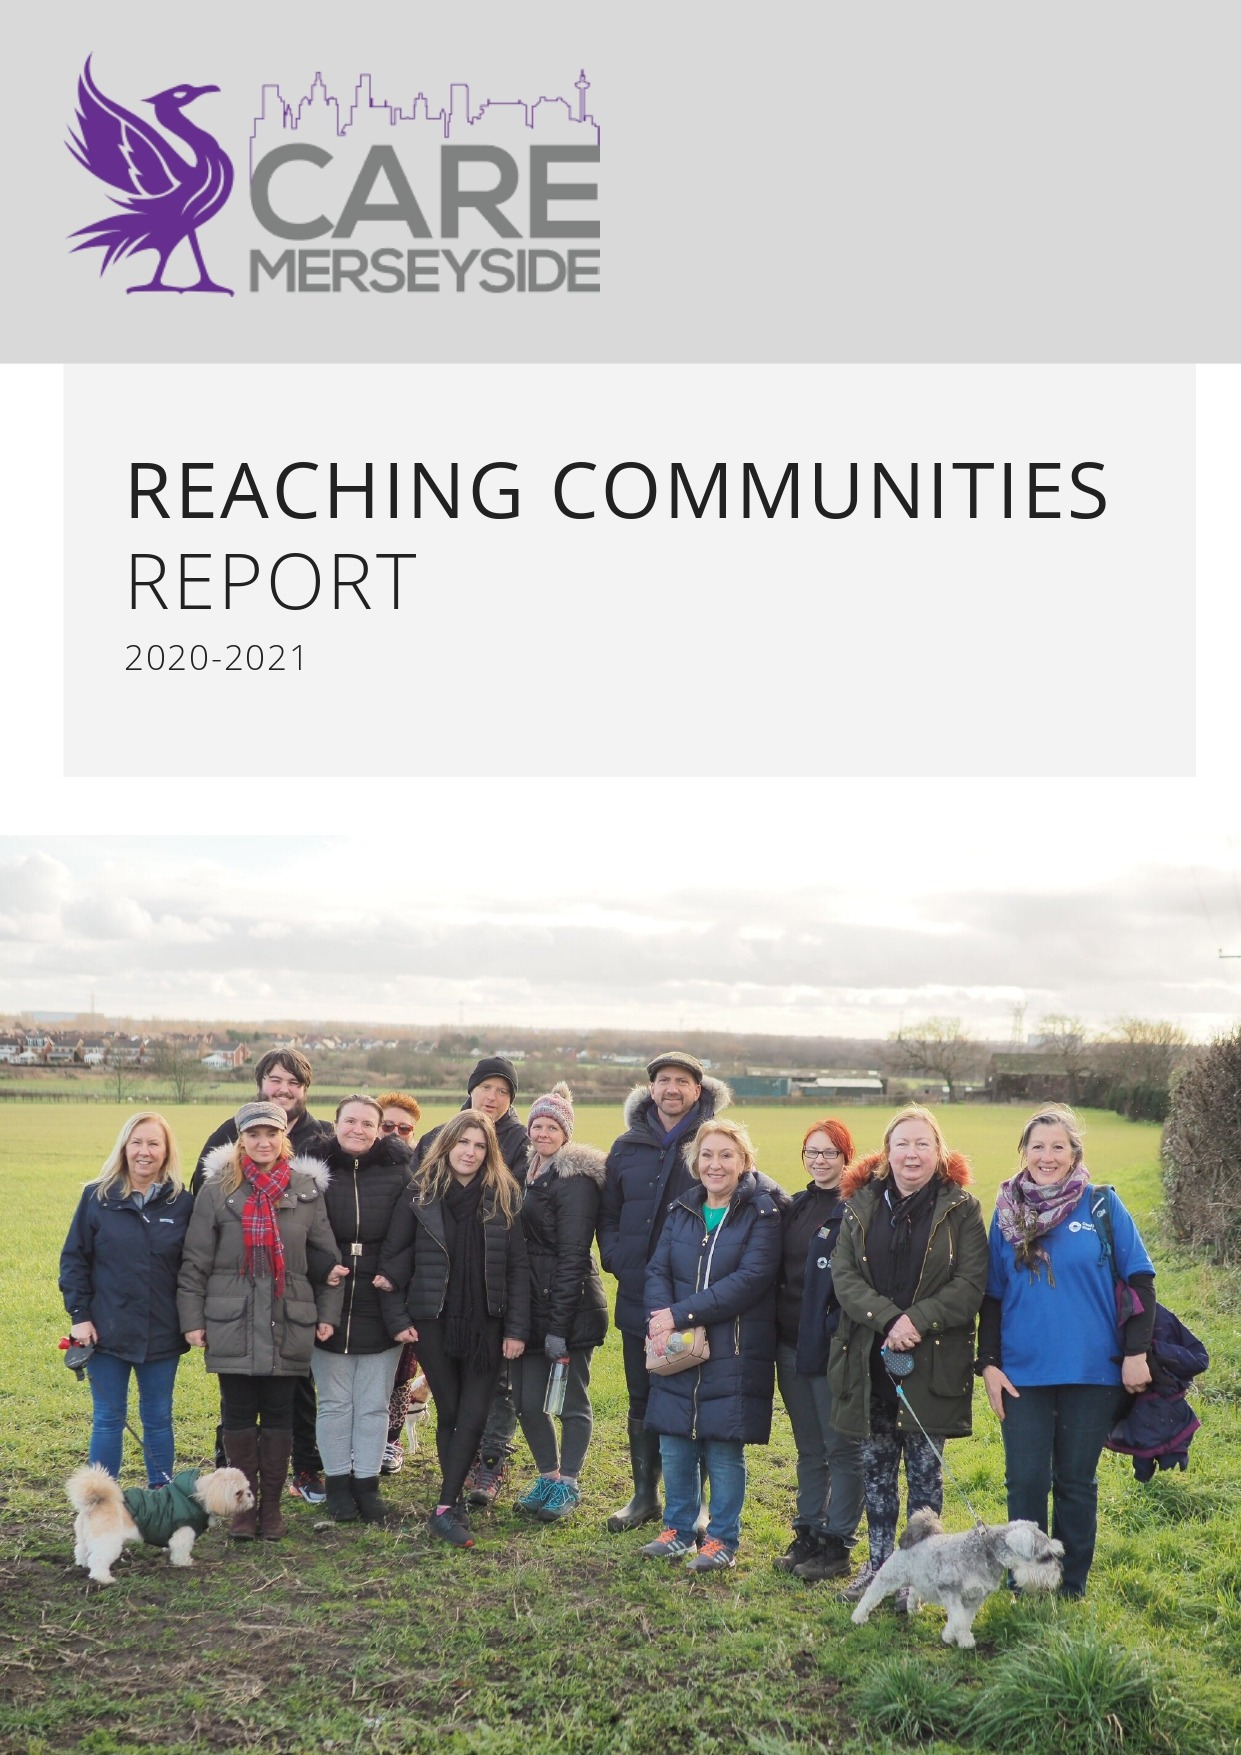 Care Merseyside - Reaching Communities Report